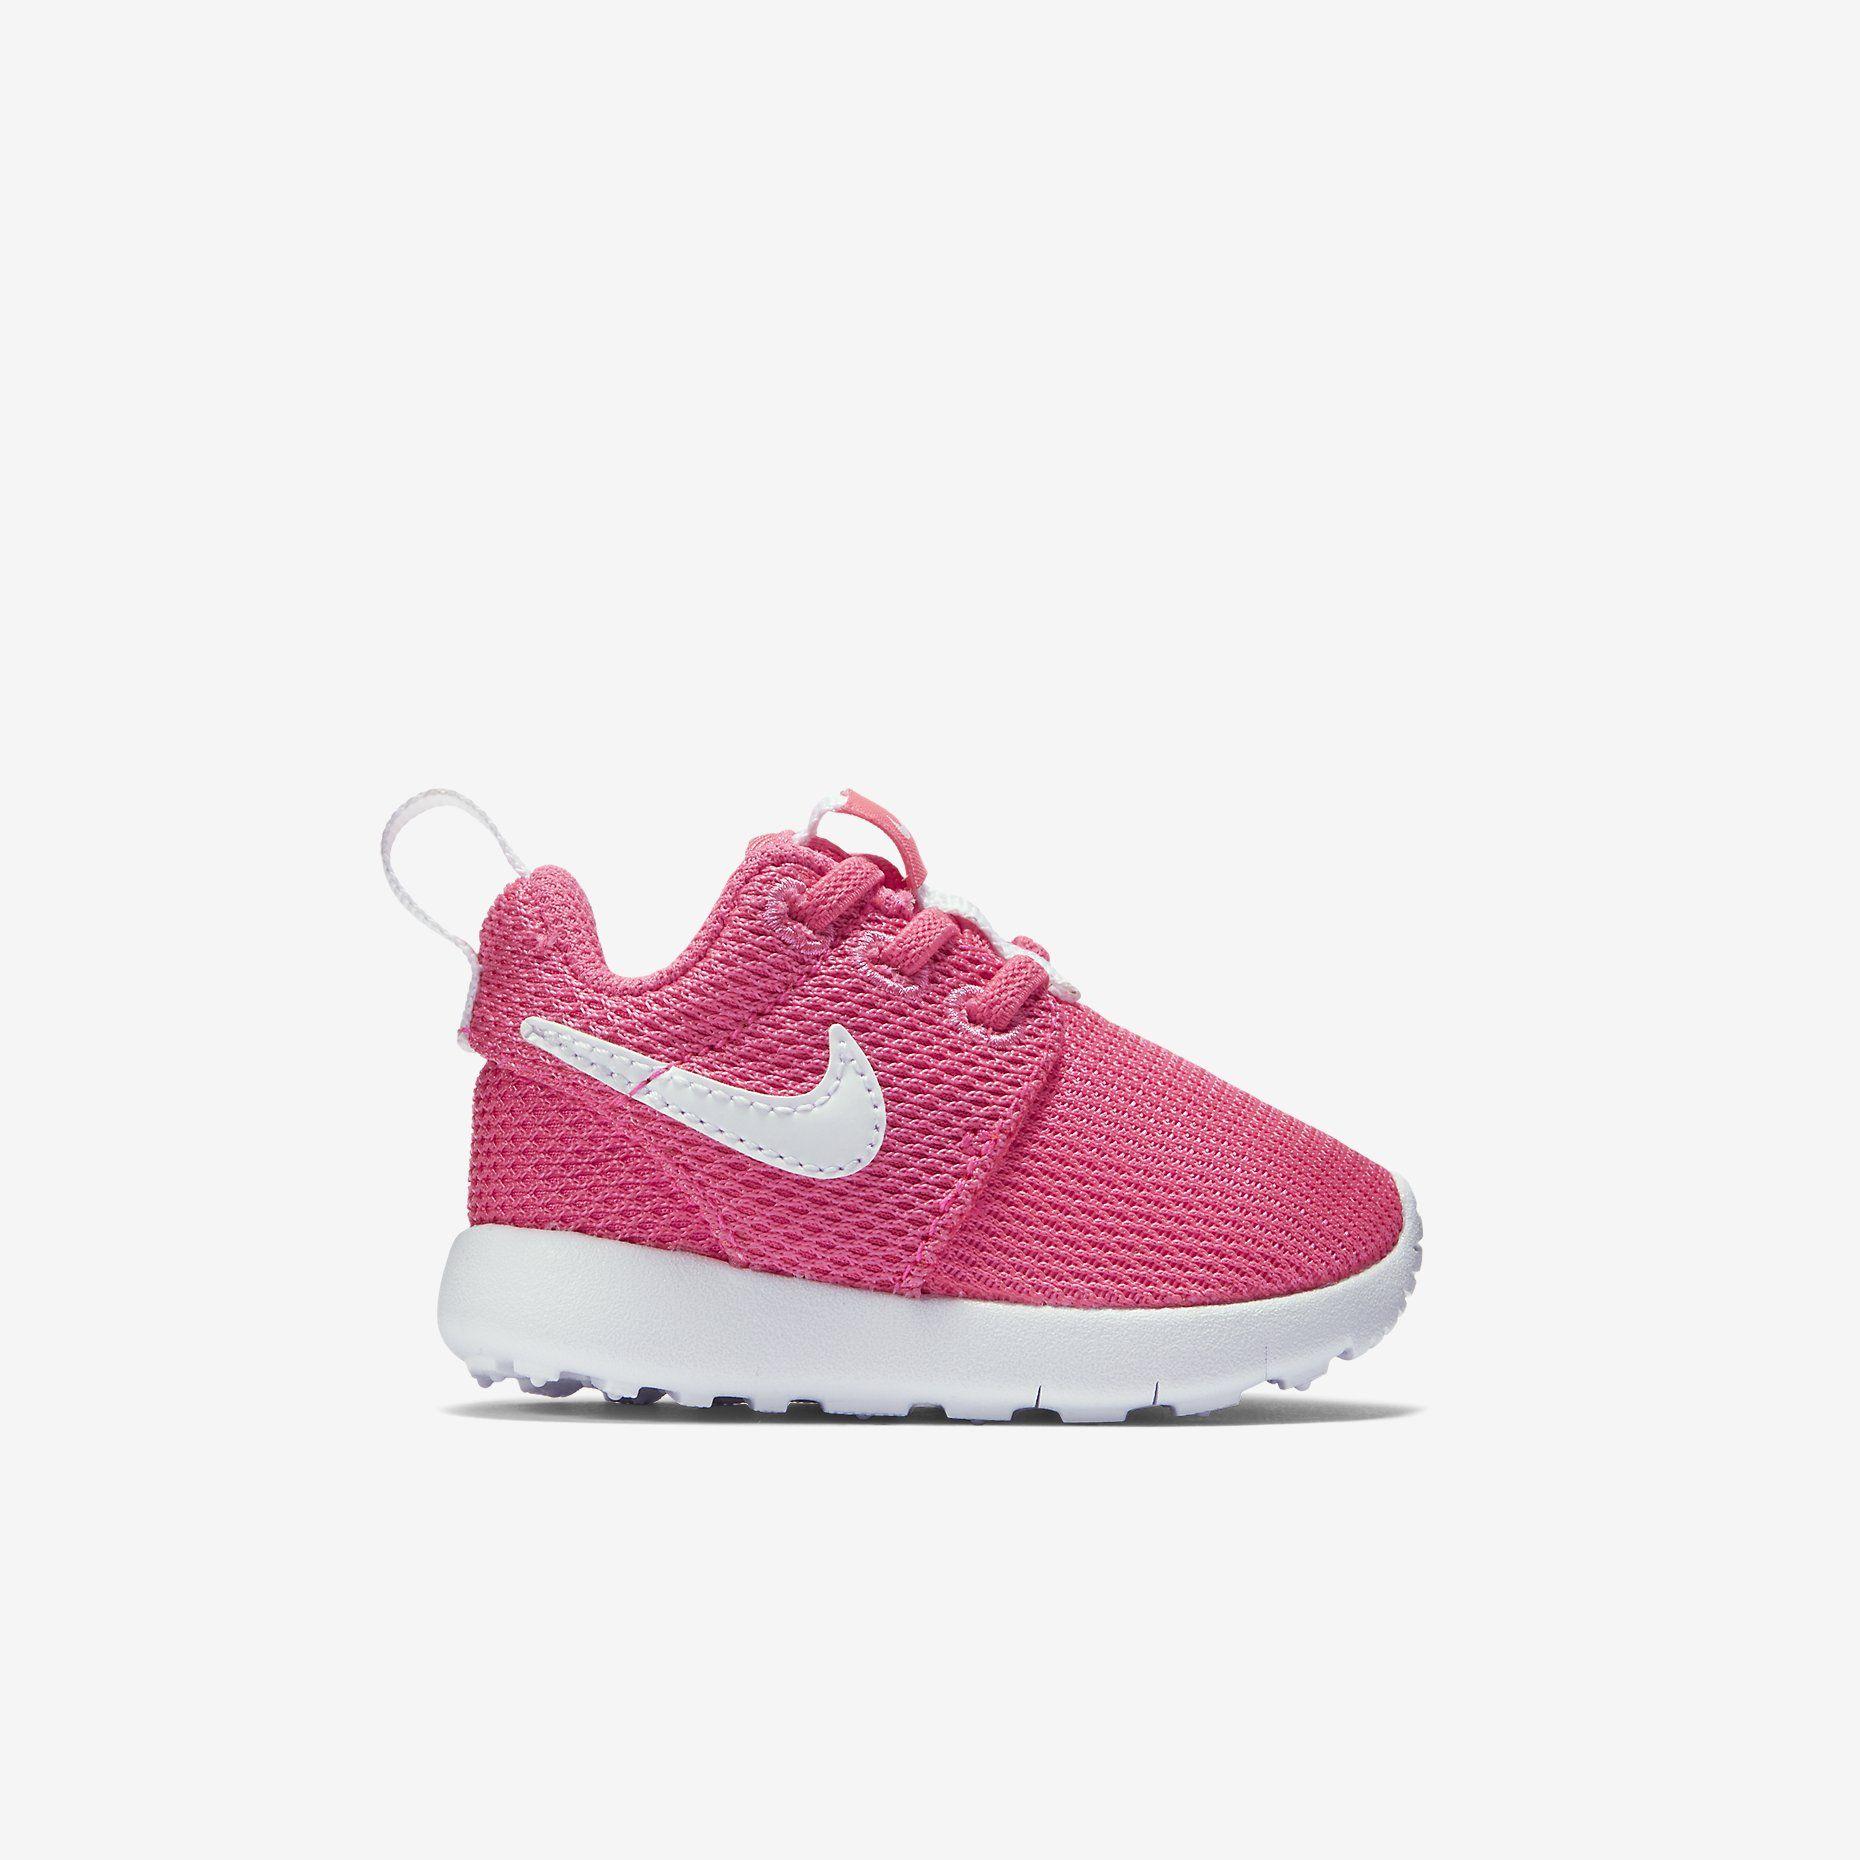 6b148057b3a96 Nike Roshe One (2c-10c) Infant Toddler Kids  Shoe. Nike Store ...